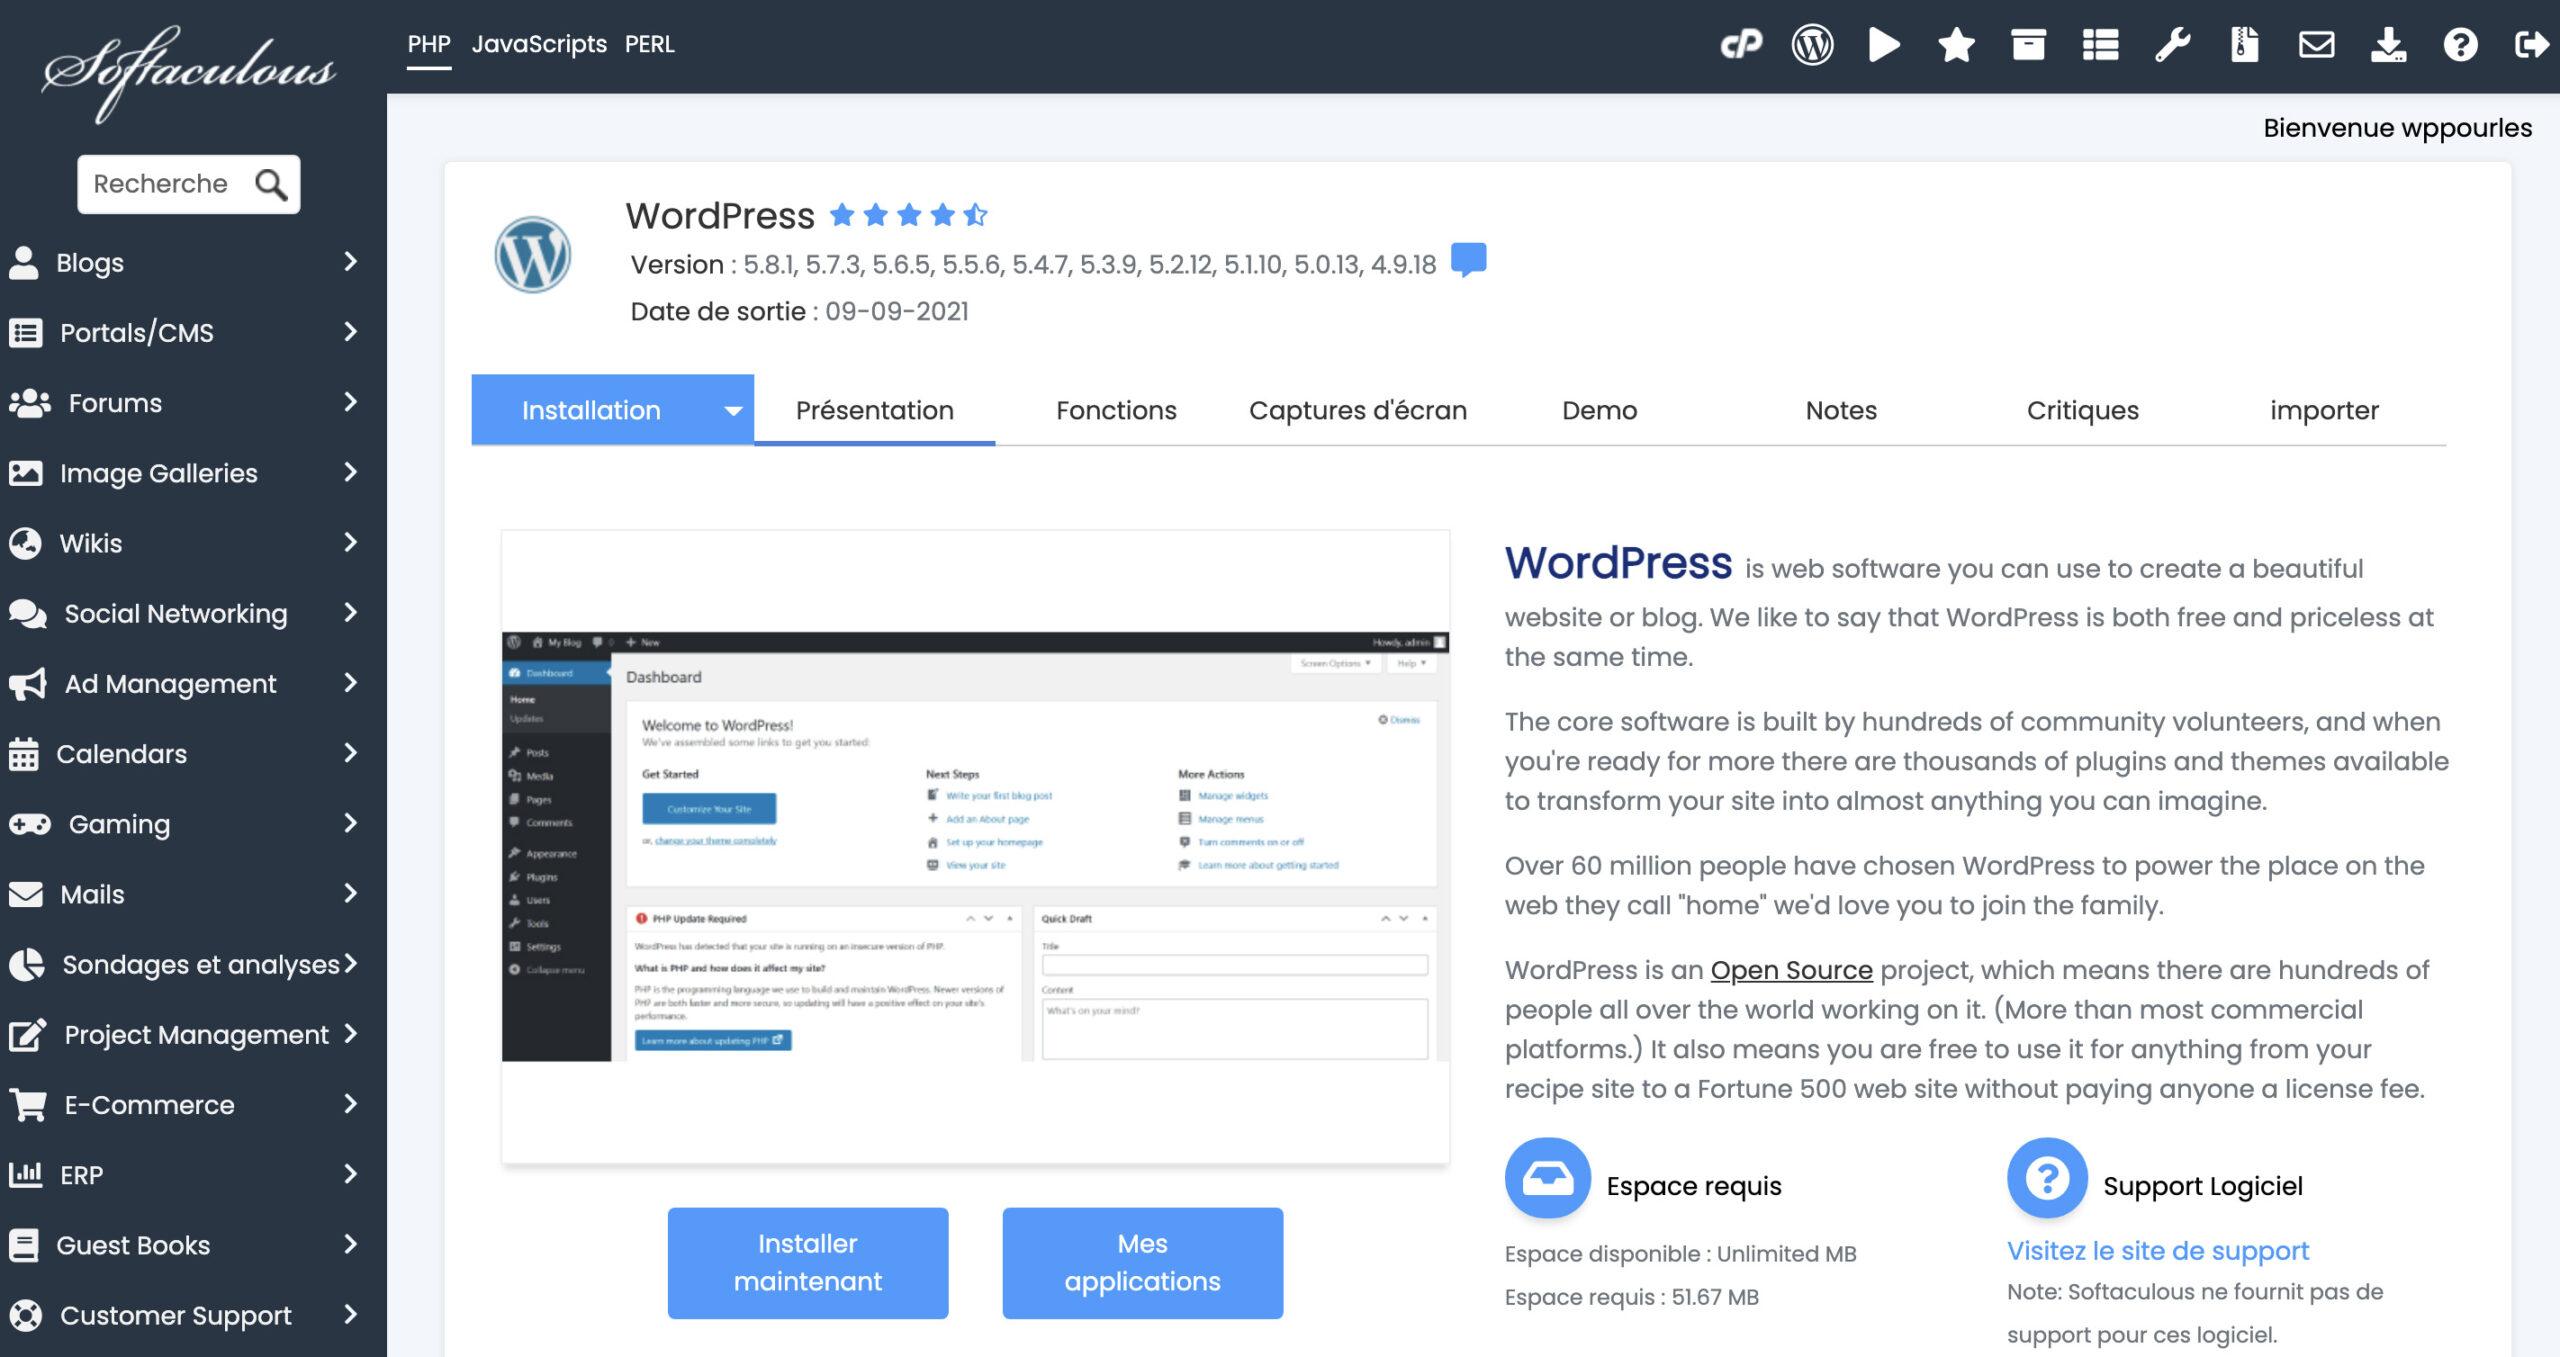 Softaculous WordPress - Accueil